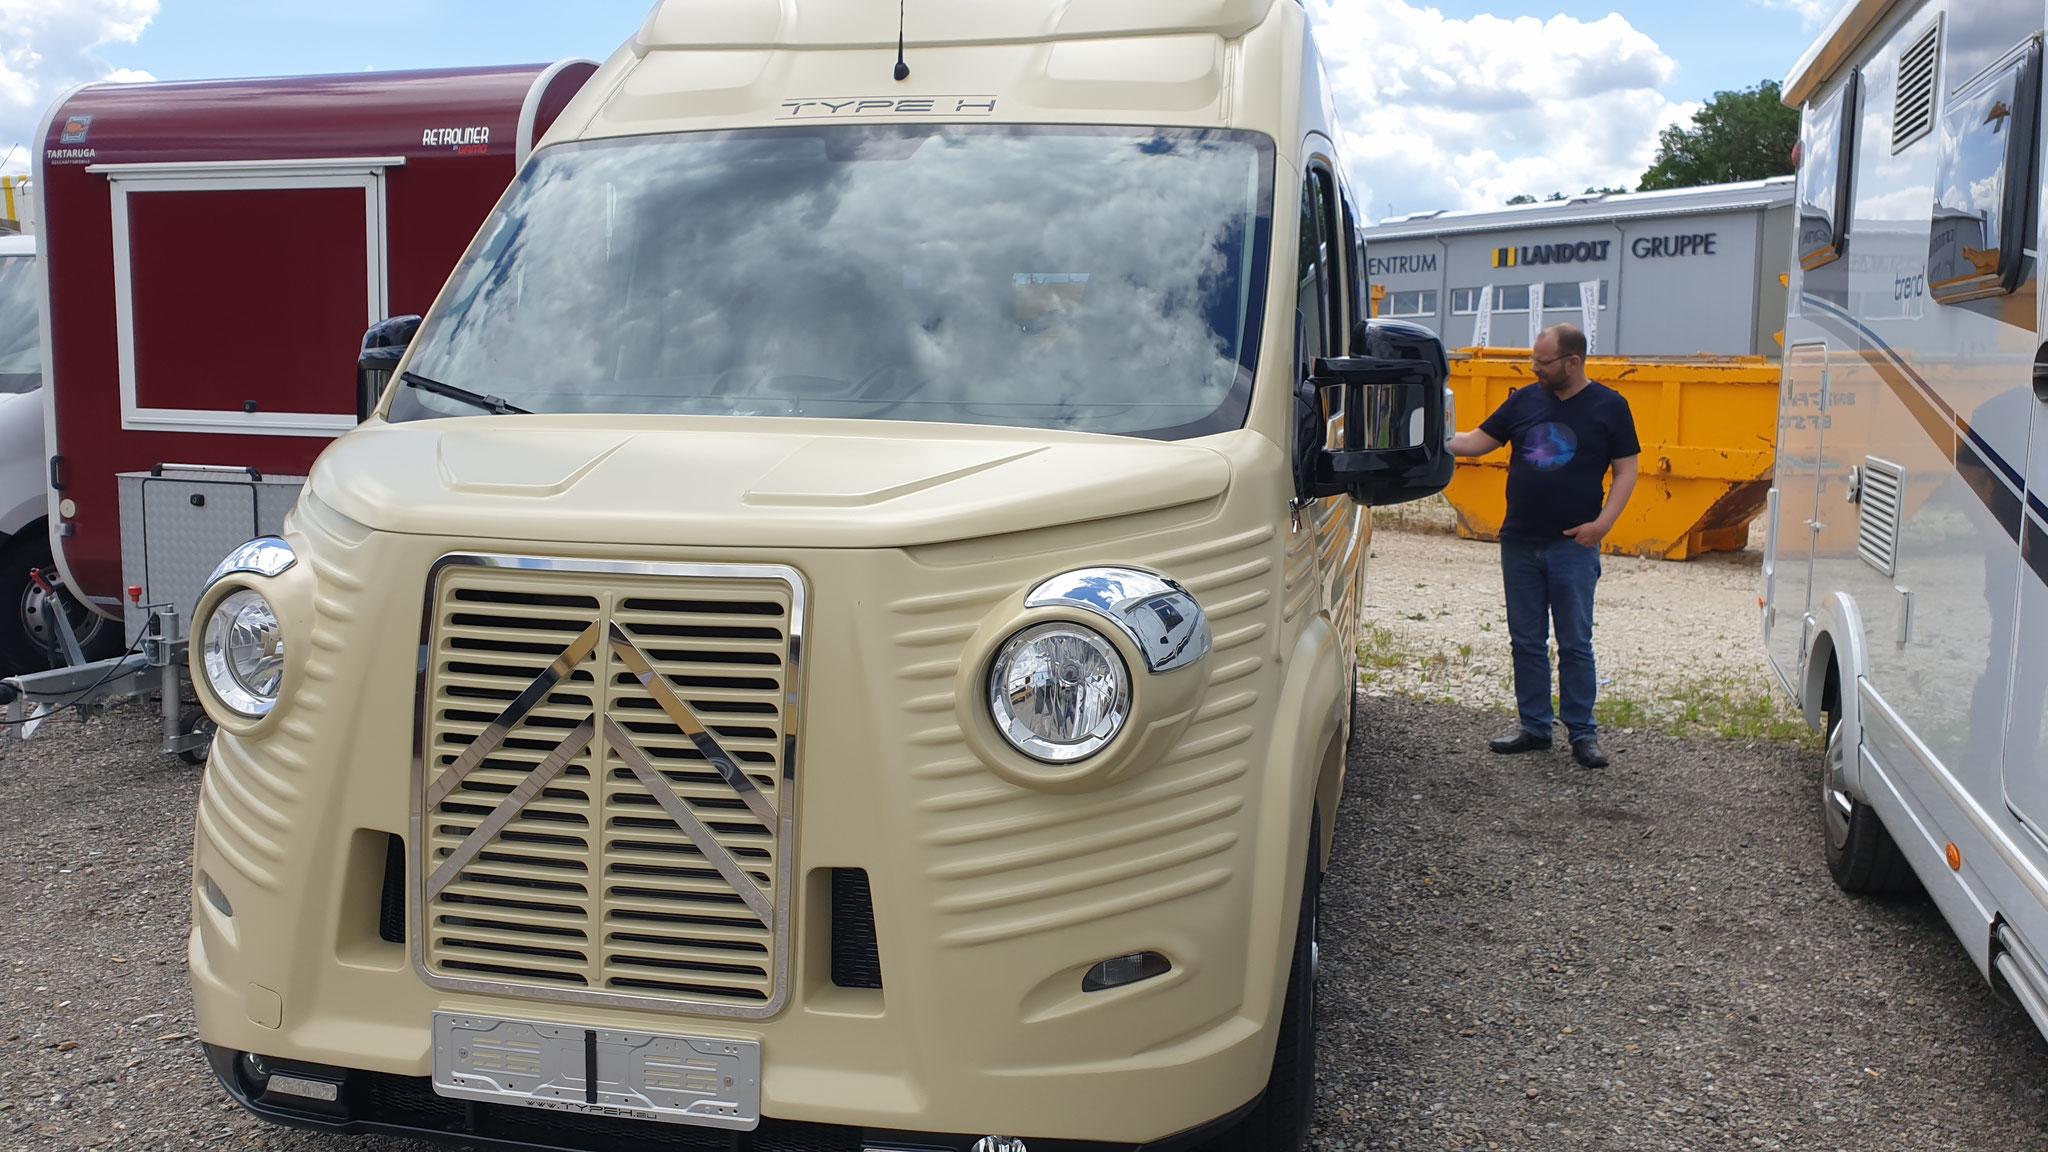 Neues Fahrzeug mit Alt-Umbau-Kit für ca. 30'000.--